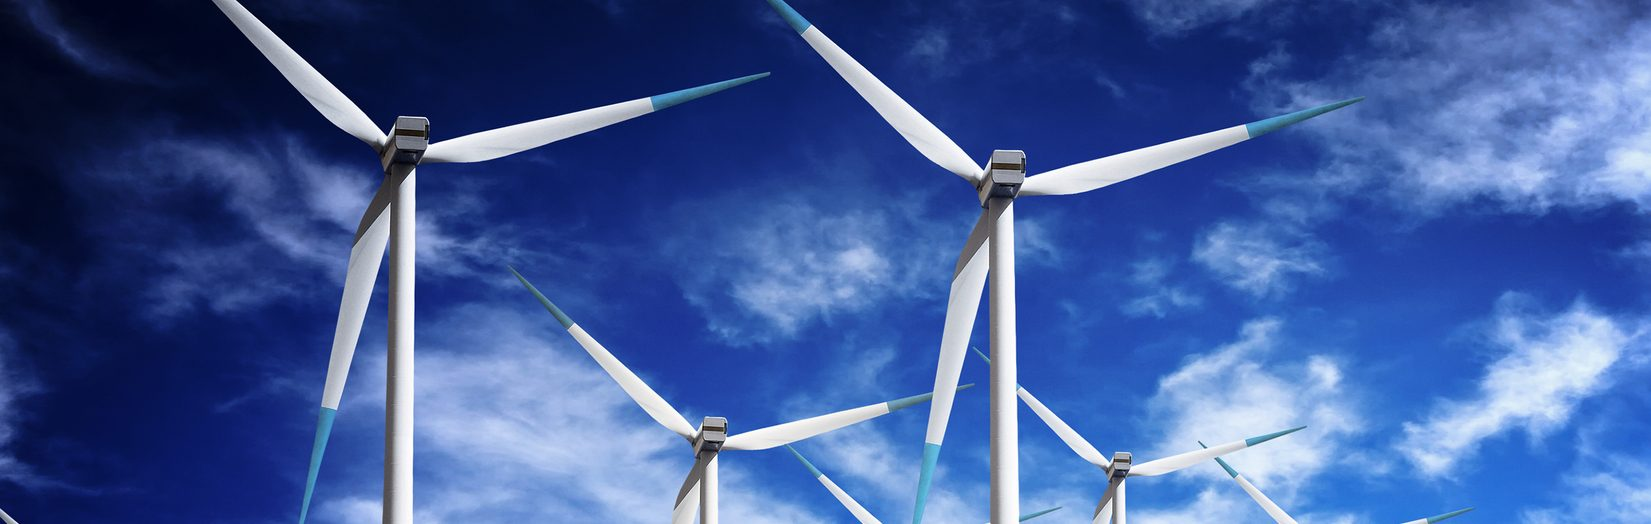 Photo of wind turbines blue sky